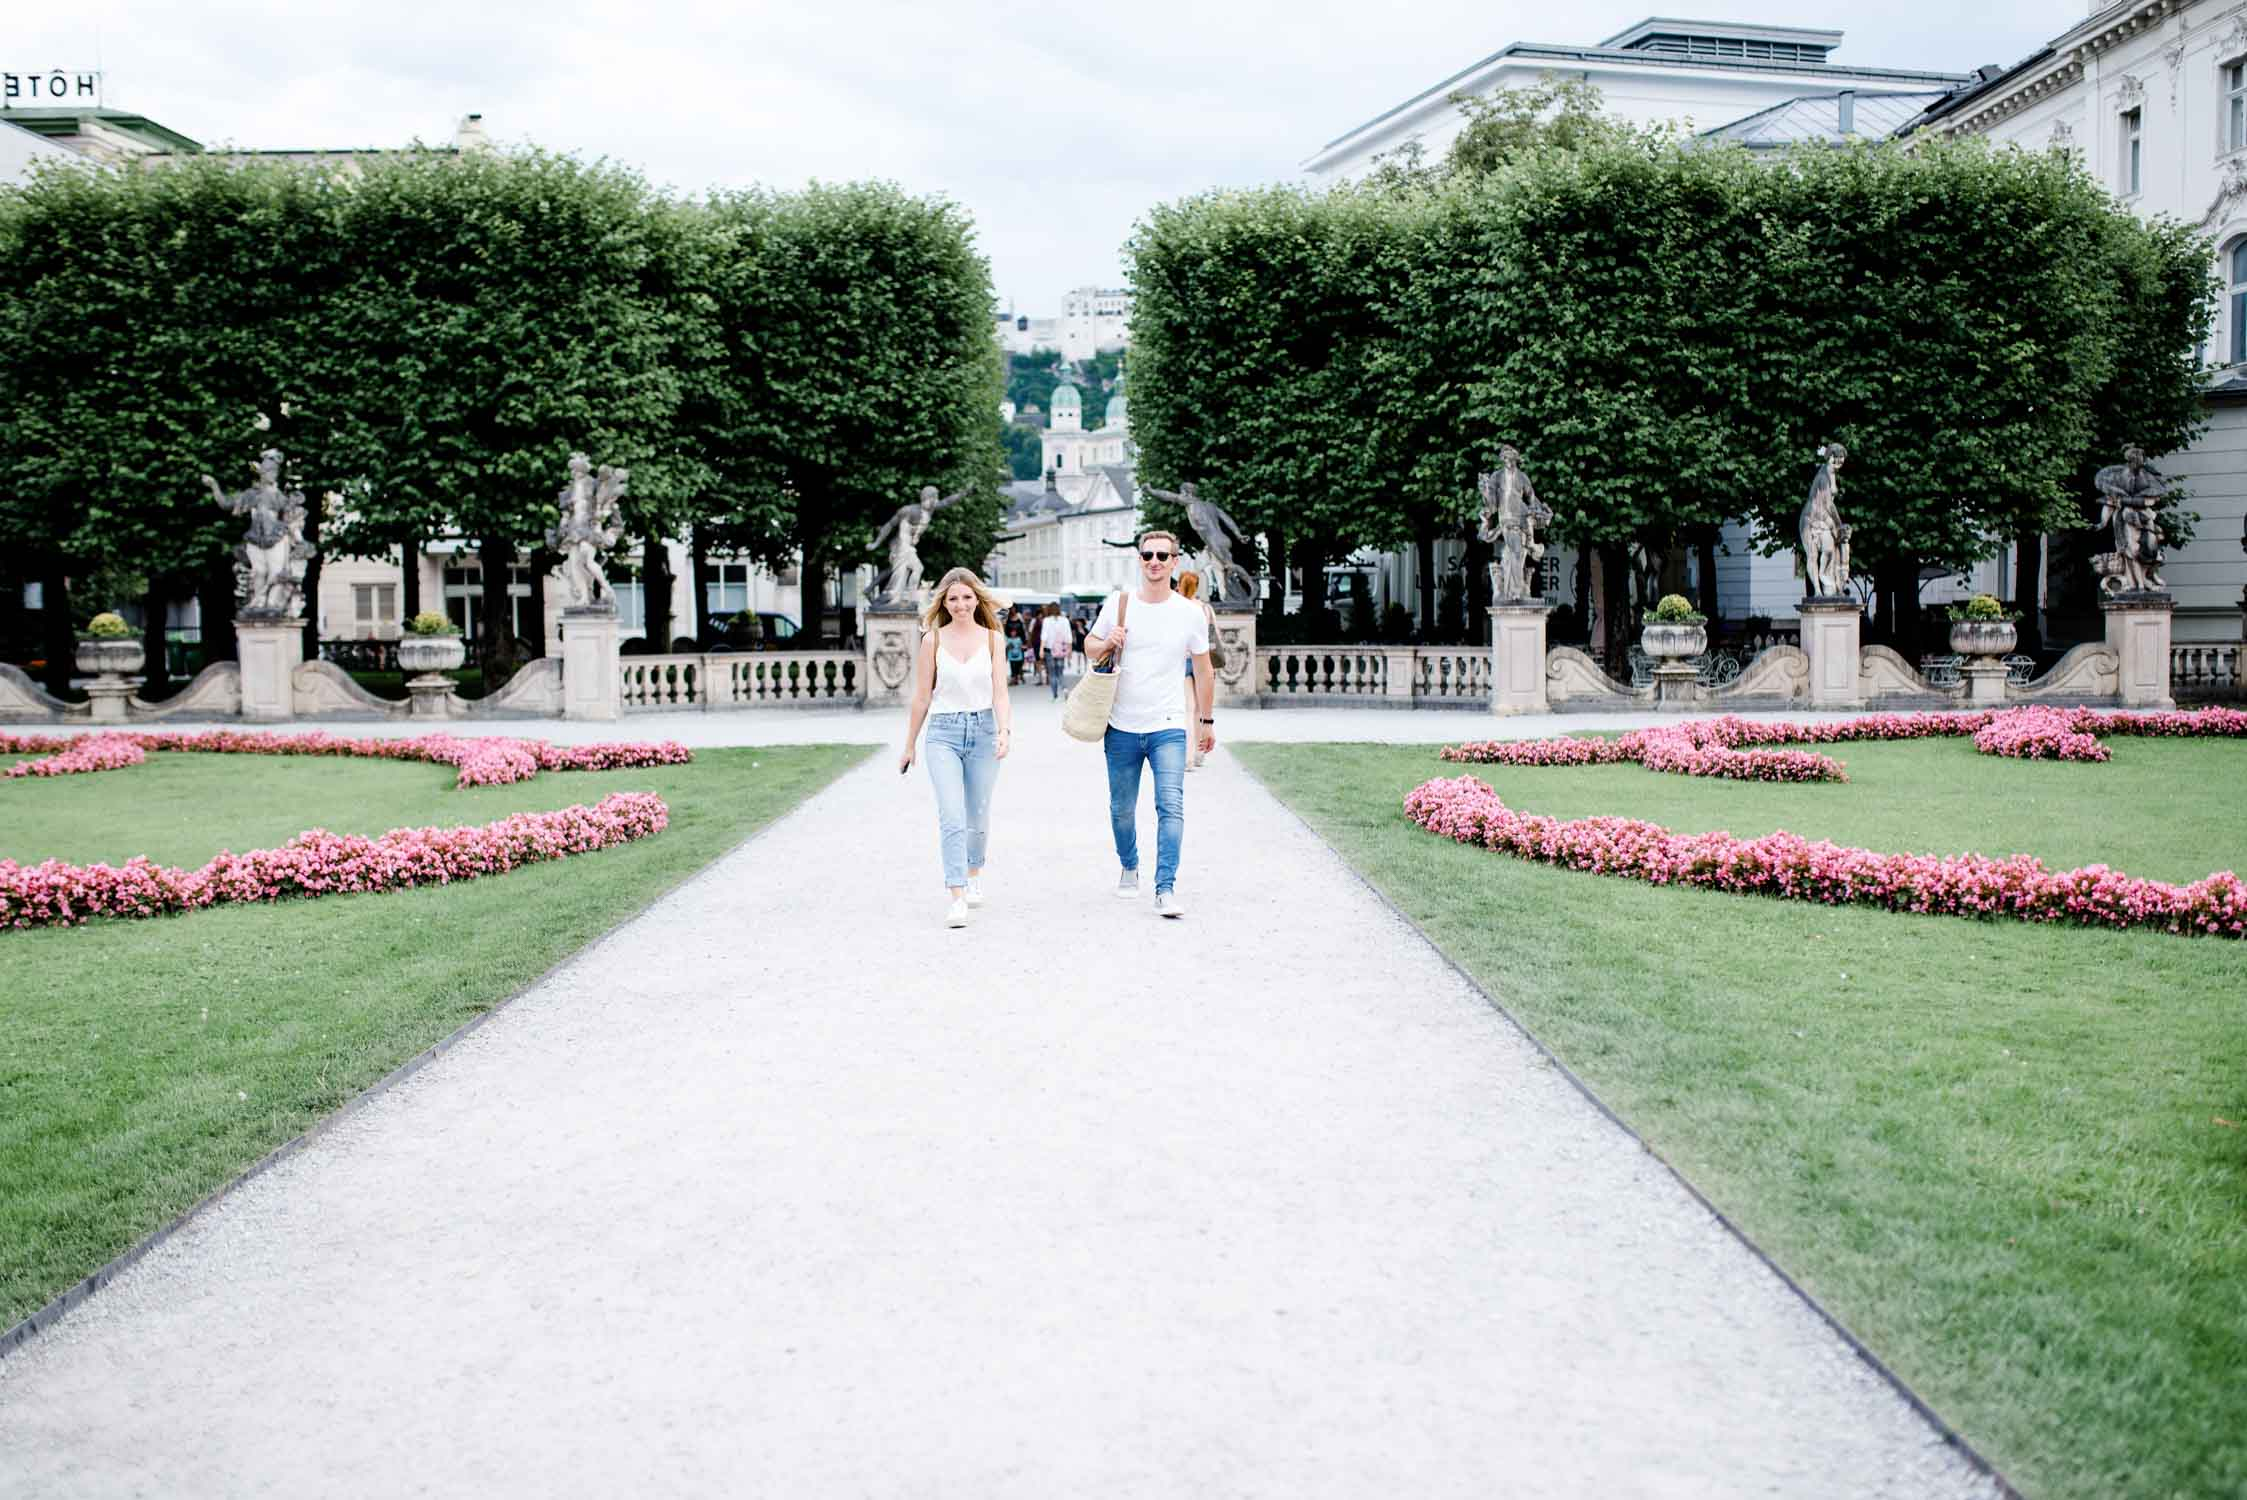 schloss mirabell salzburg tipps cafes restaurants plätze sightseeing blogger must see salzburg